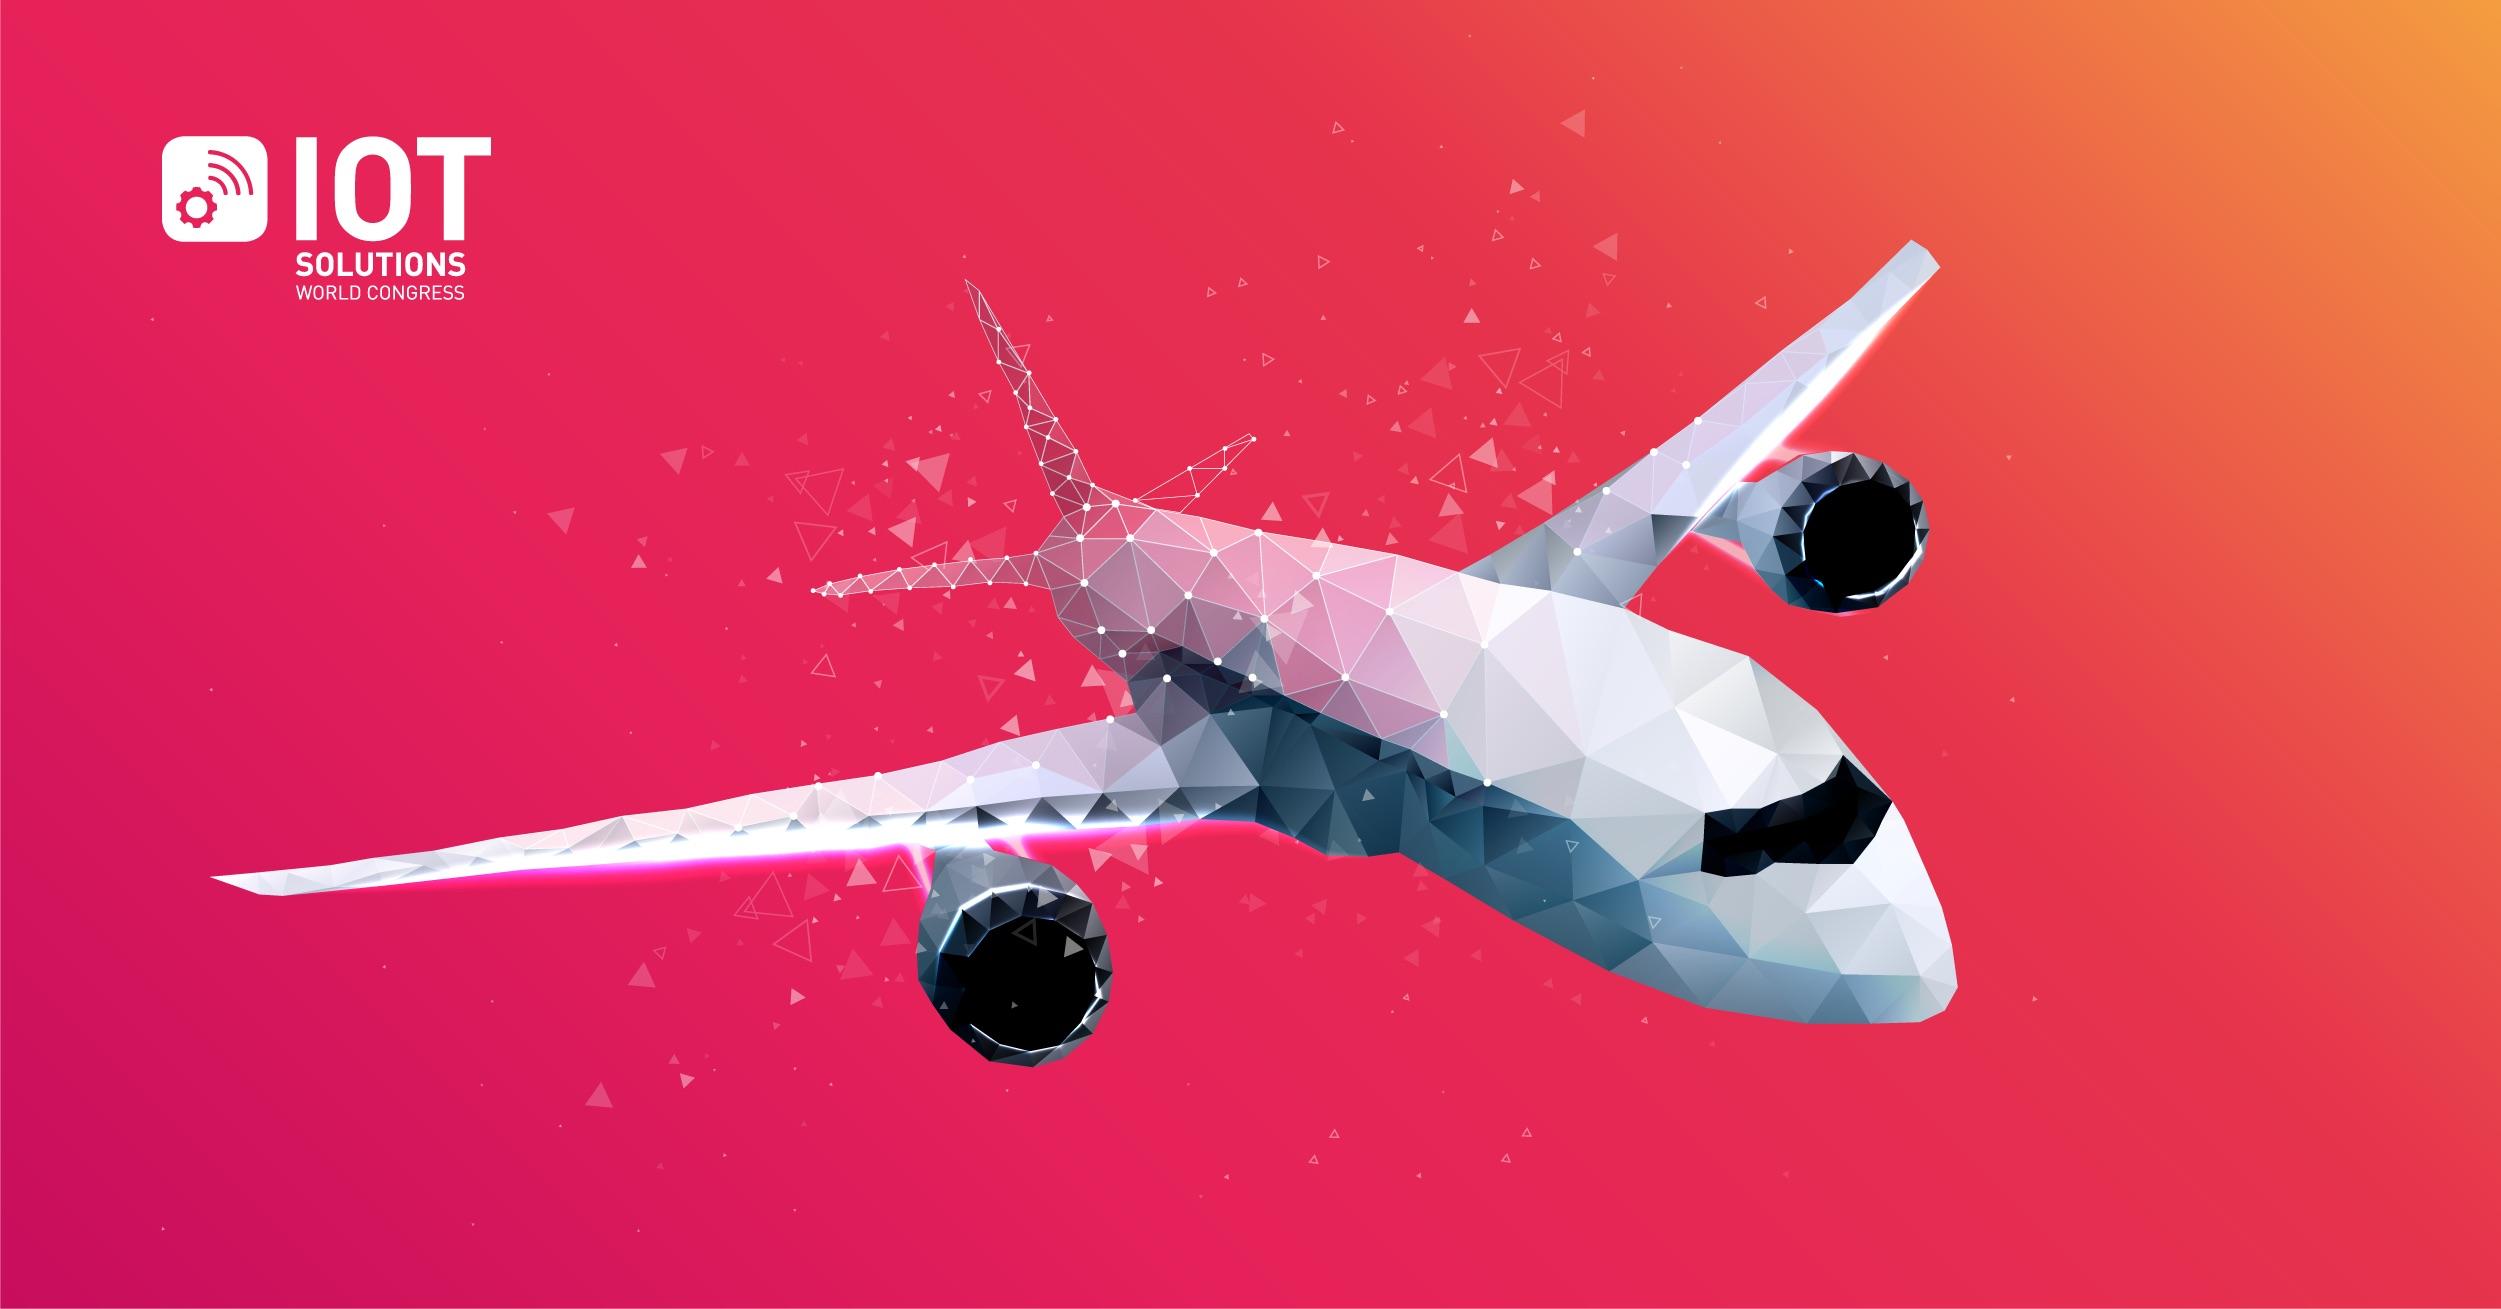 IOTSWC19-Blog-Airlines-IoT